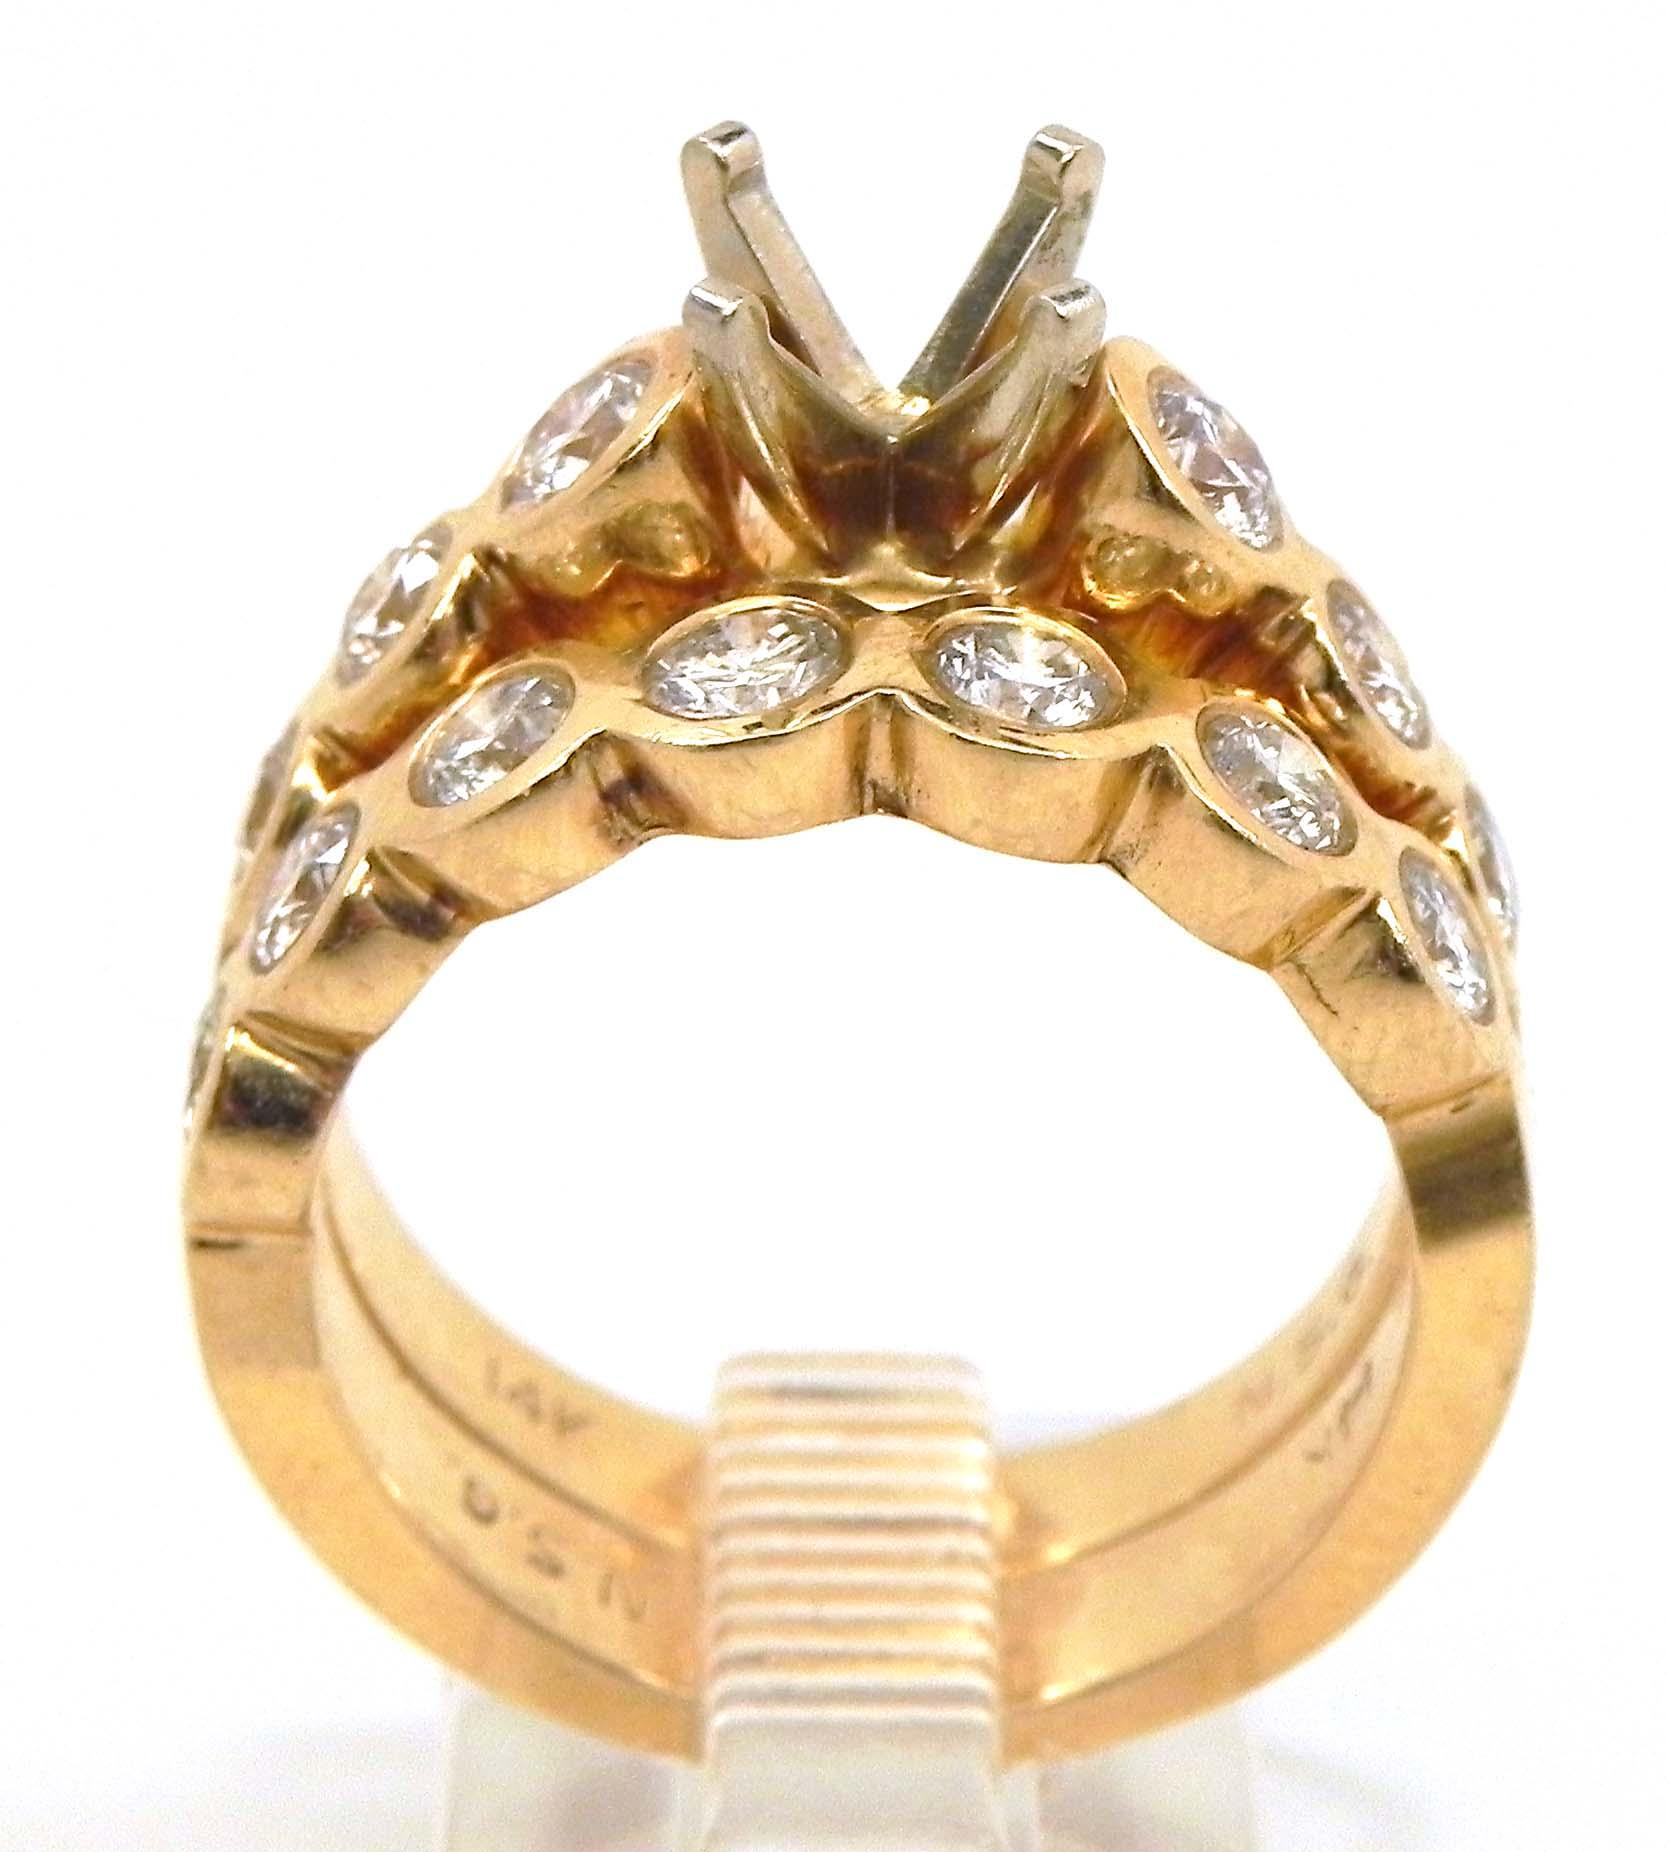 La s 14k Yellow Gold 1 12 Cts Bezel Set Diamonds Semi Mount